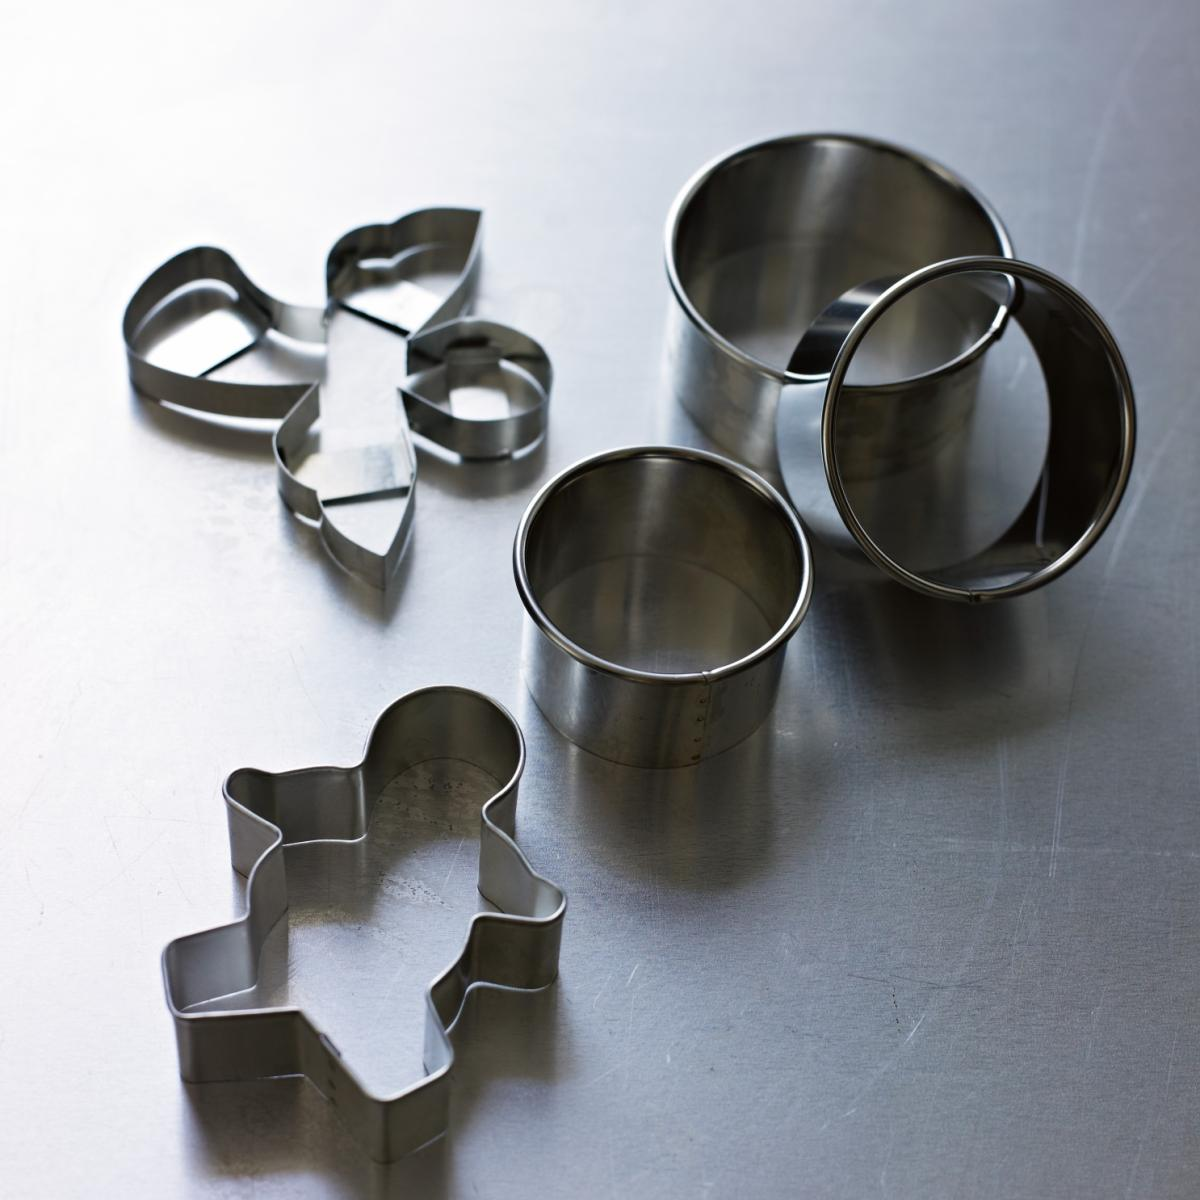 Equipment cutters